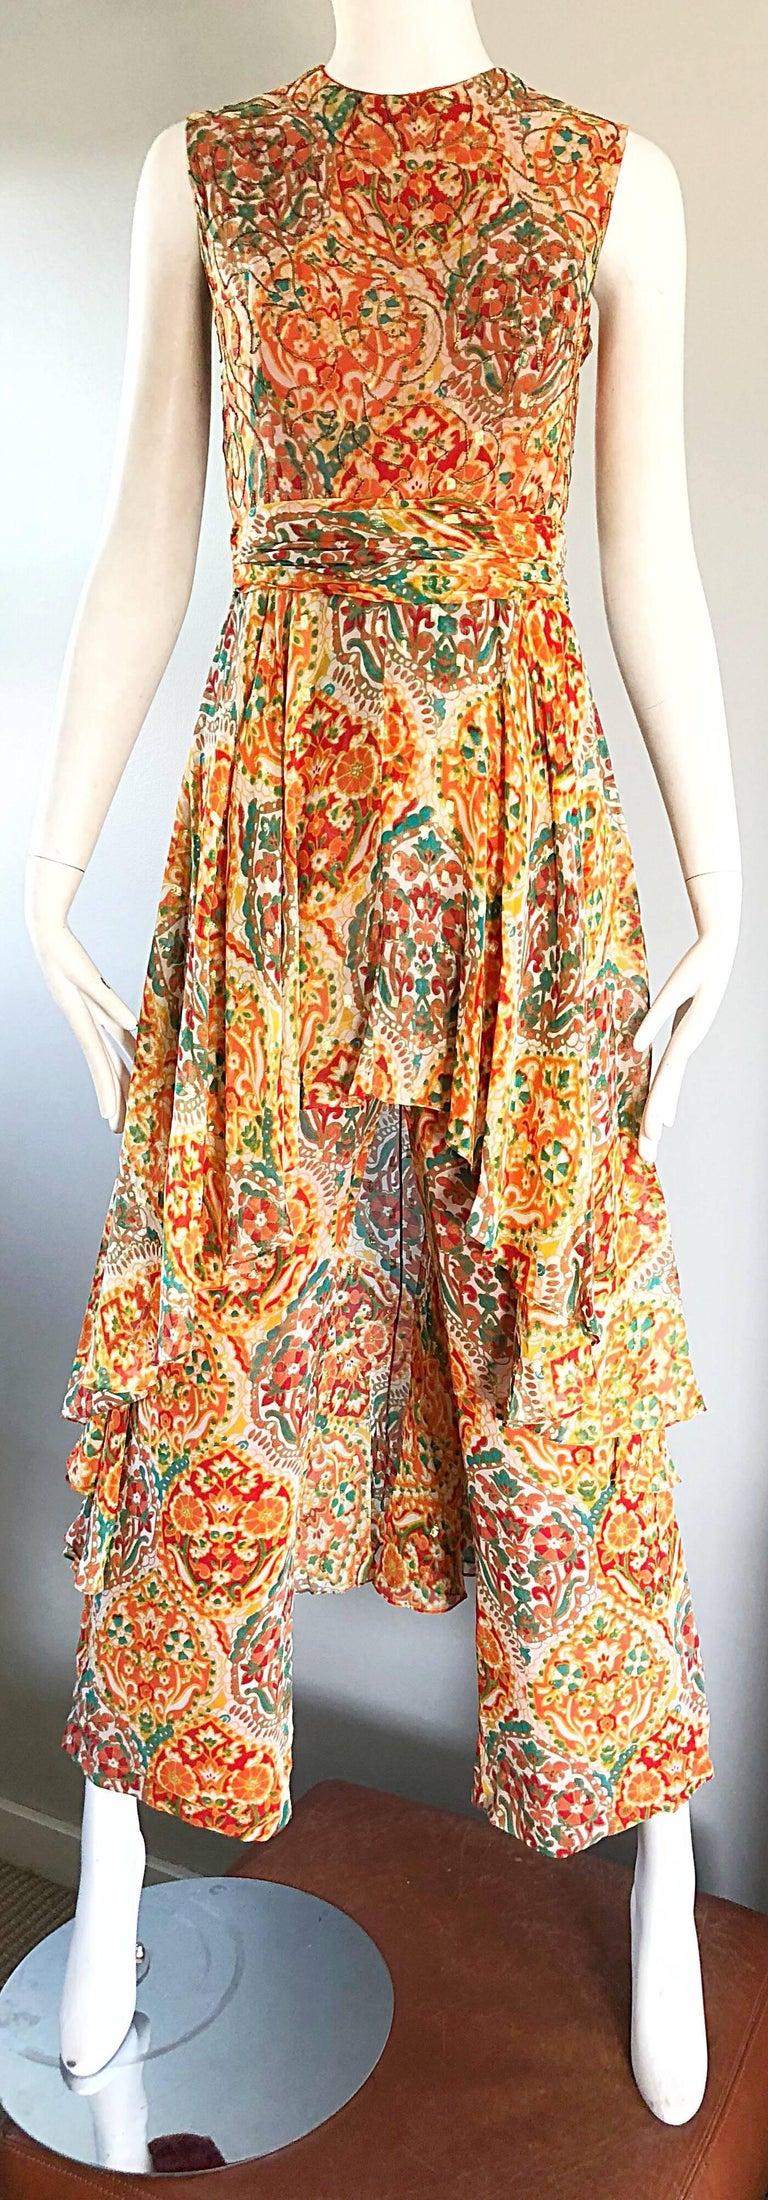 Oscar de la Renta Silk Boho Batik Print Vintage Jumpsuit with Attached Skirt  For Sale 4